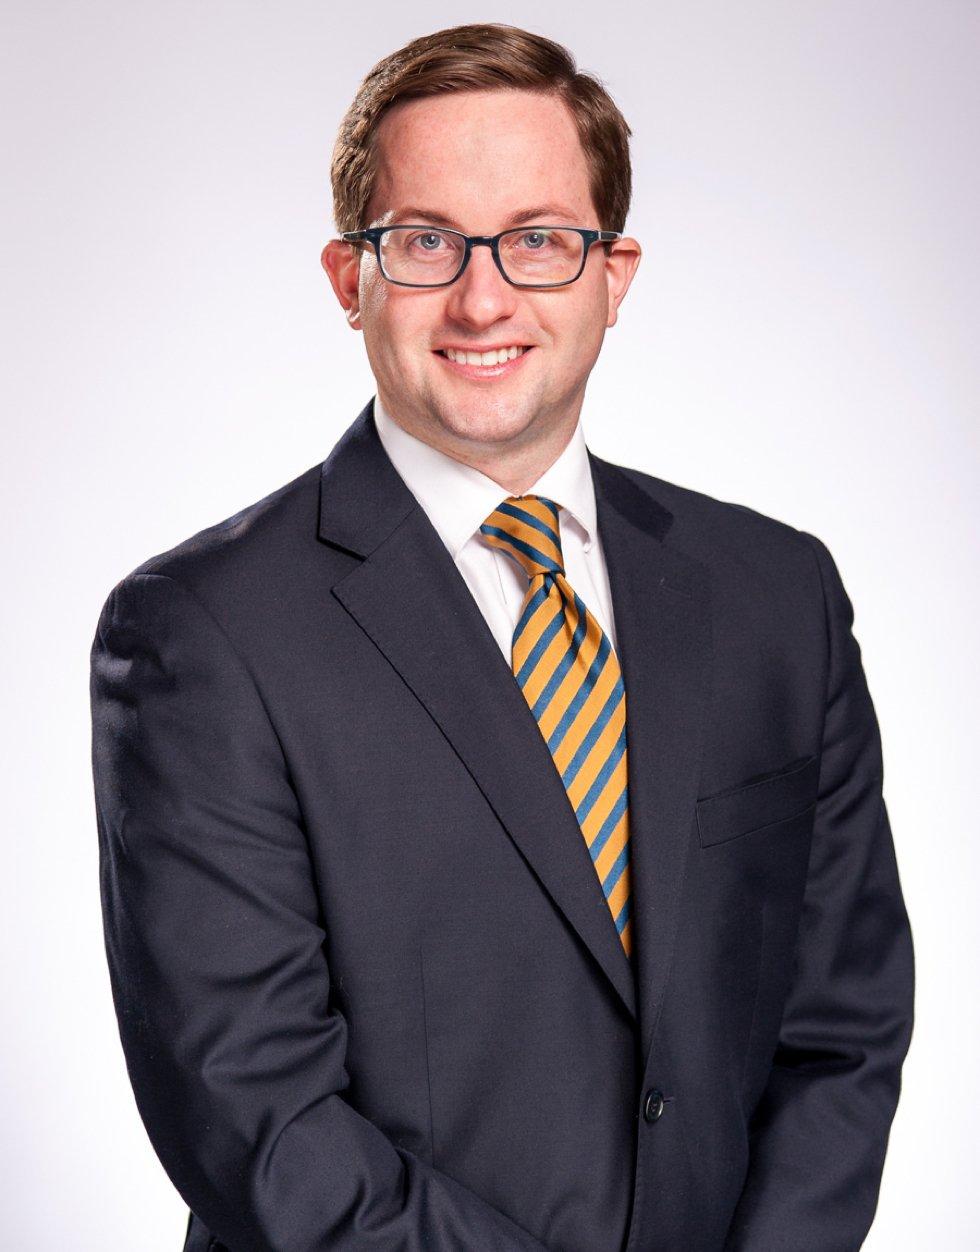 Daniel J. McCann, Esq.